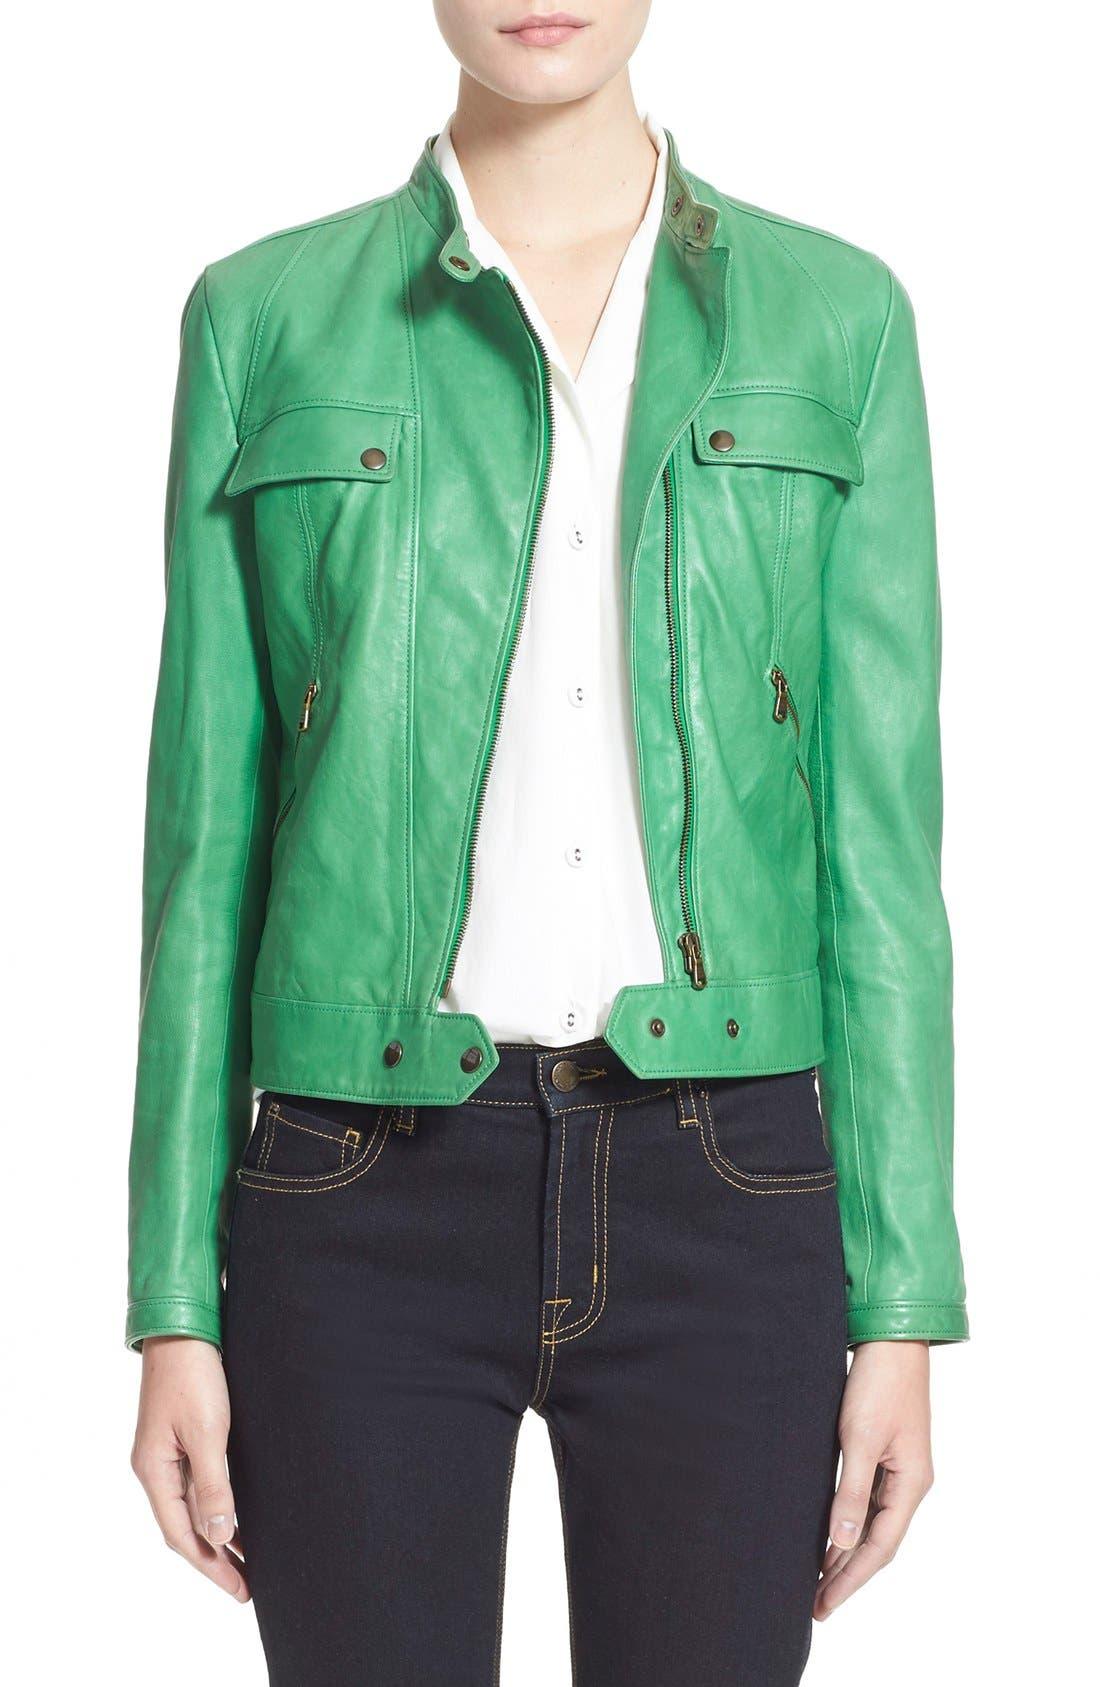 Alternate Image 1 Selected - Tomas Maier Nappa Leather Moto Jacket